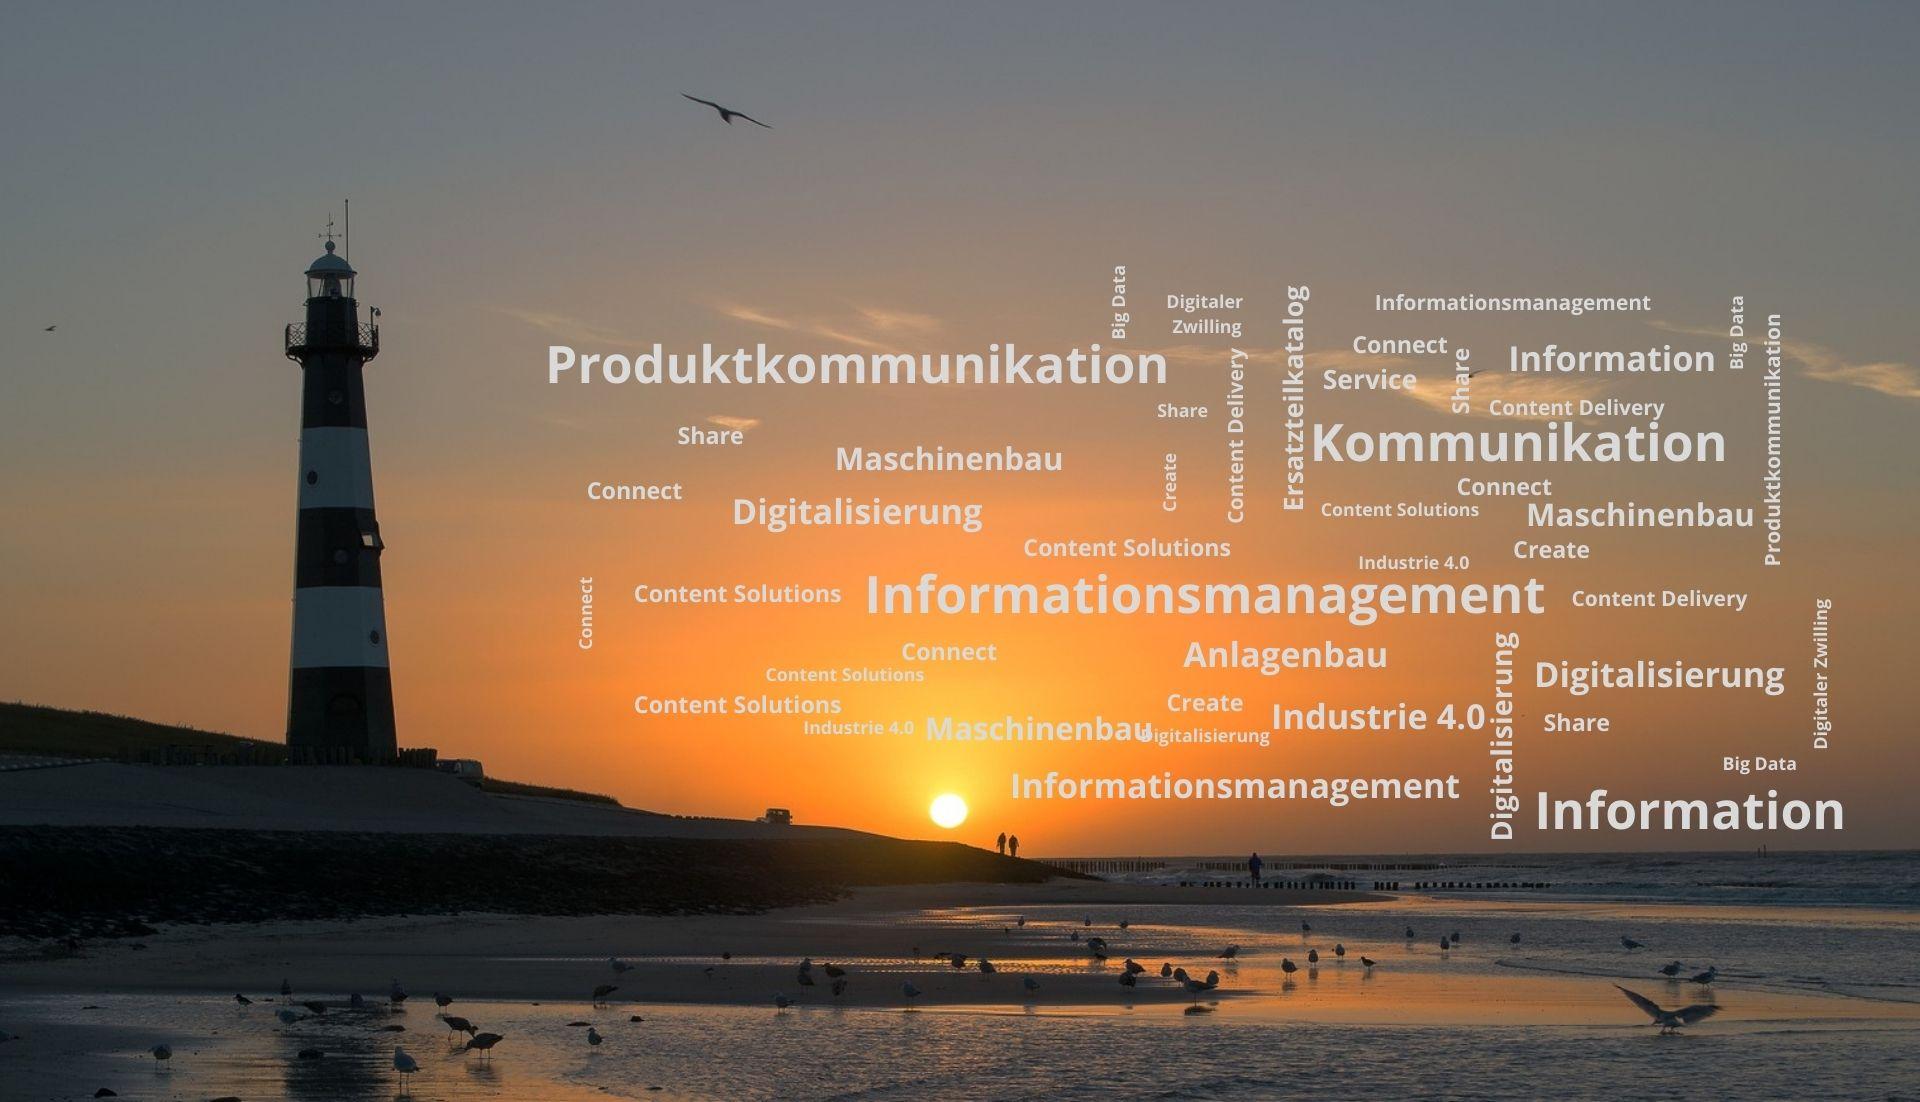 Produktkommunikation im Maschinenbau